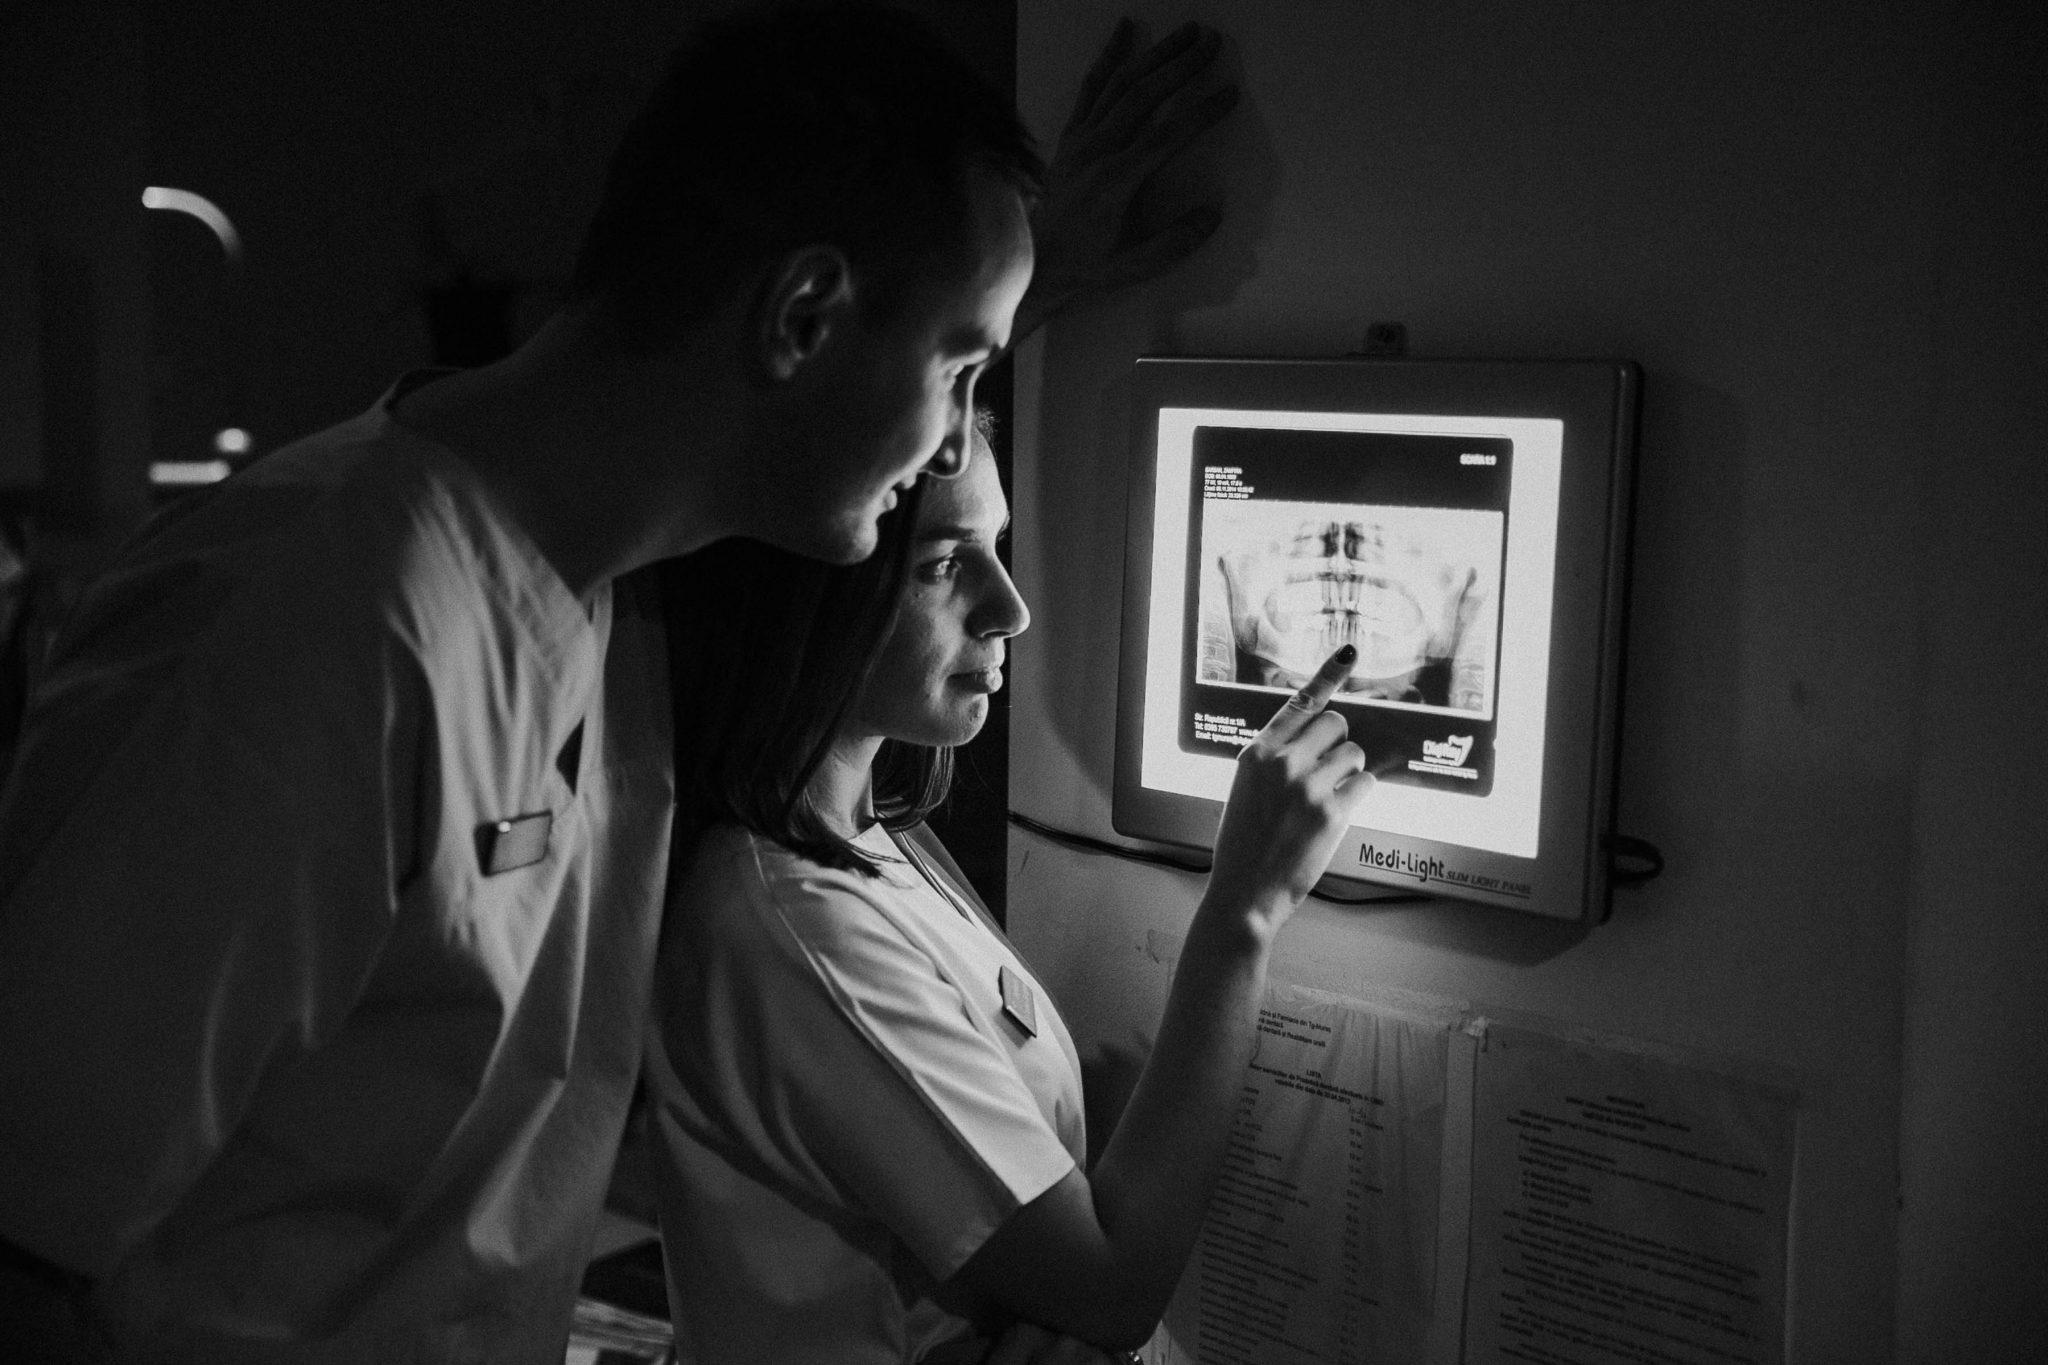 facultatea de stamatologie targu mures UMF absolvenit stamatolog medic doctor fotografie comerciala fotograf profesionist majos daniel_-17